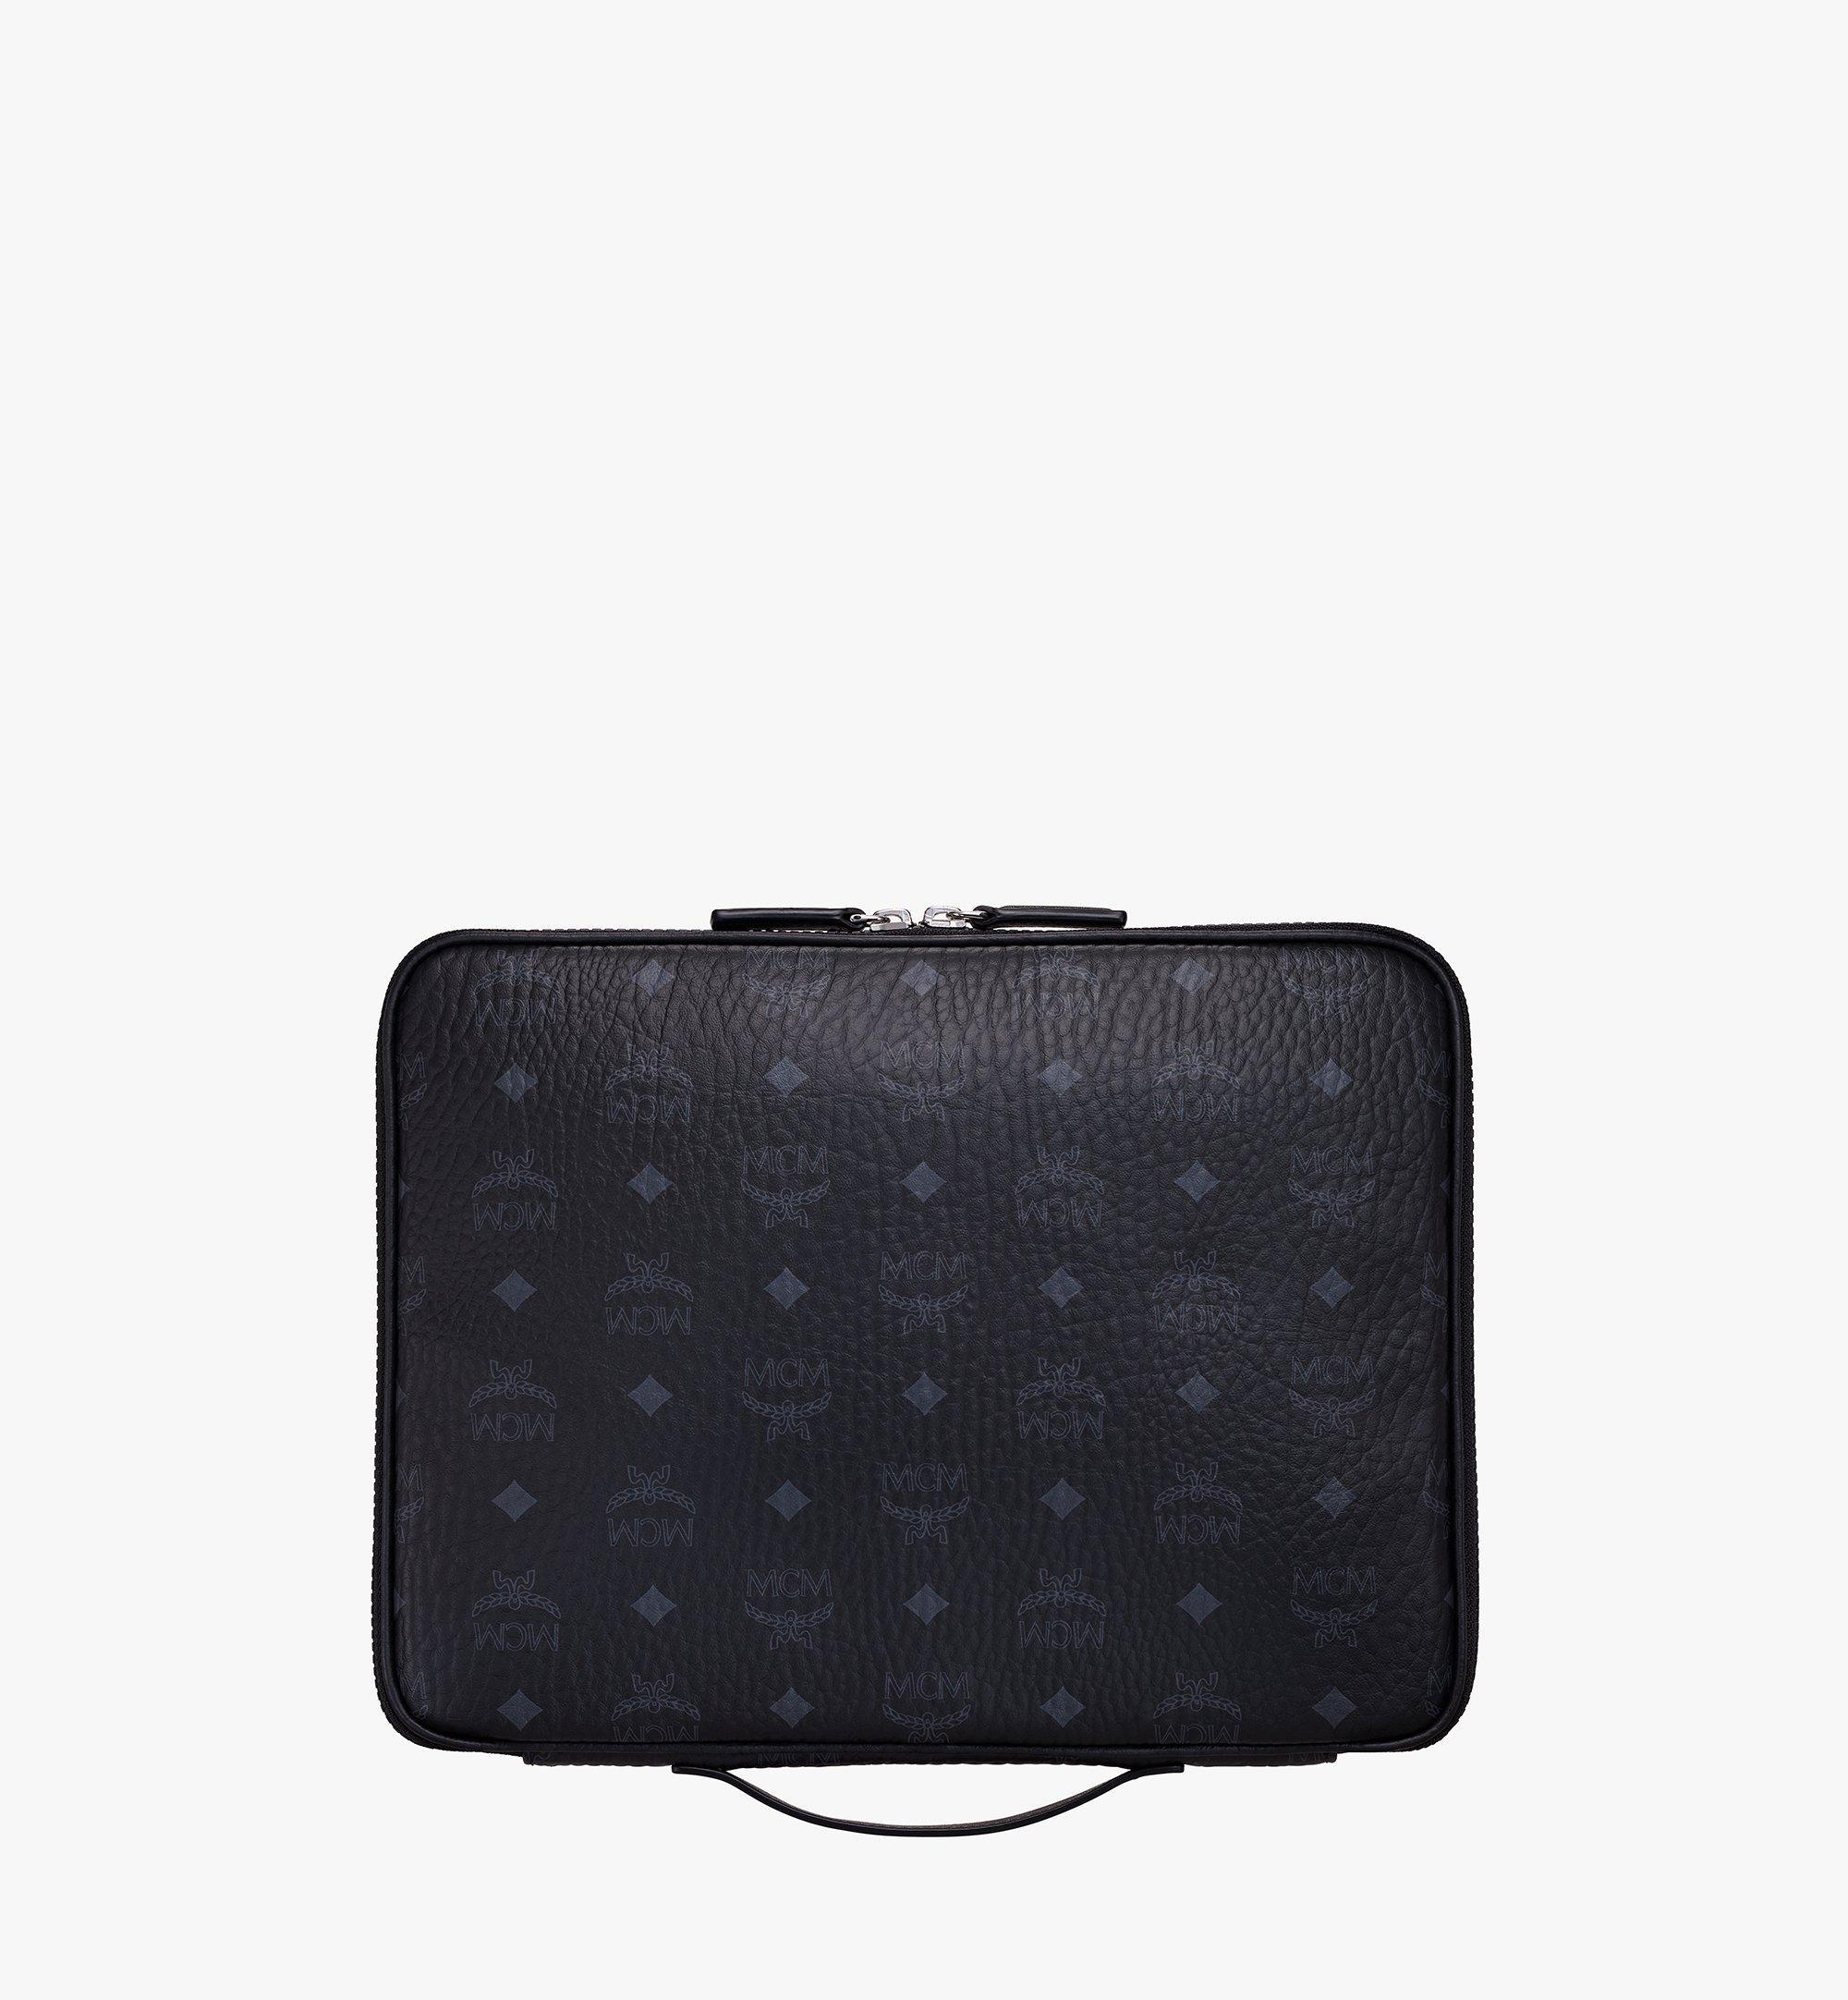 MCM Visetos Original 13 吋 iPad 保護套 Black MXEAAVI03BK001 更多視圖 2